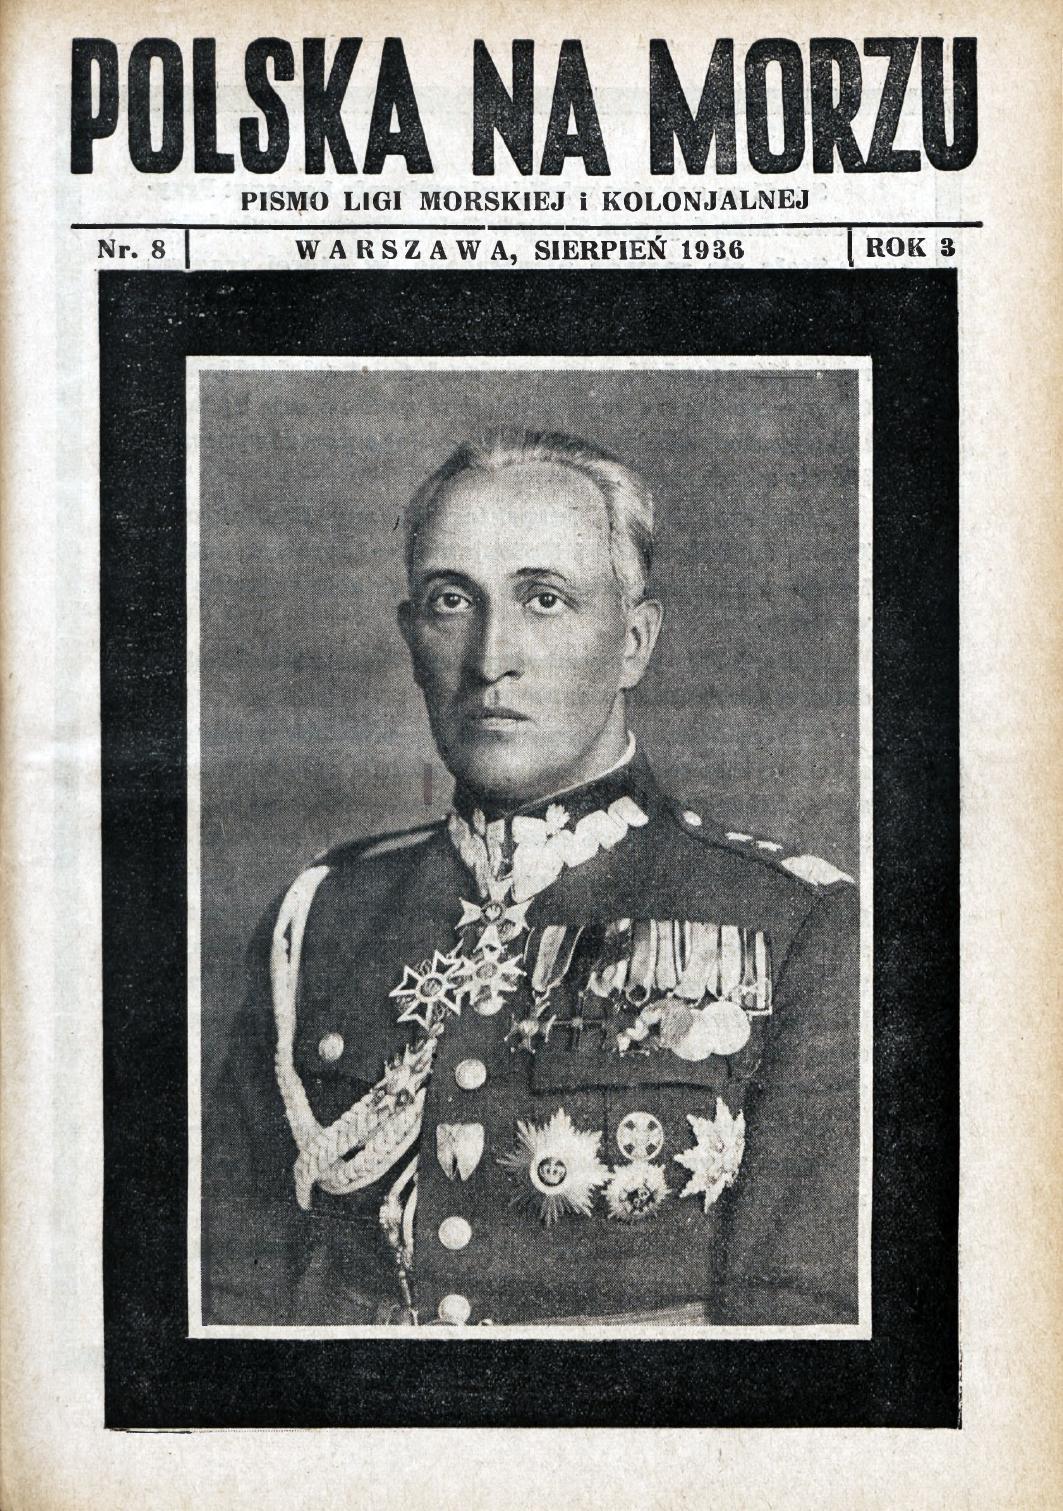 Polska na Morzu : pismo Ligi Morskiej i Kolonjalnej. - Liga Morska i Kolonjalna, 1936, nr 8